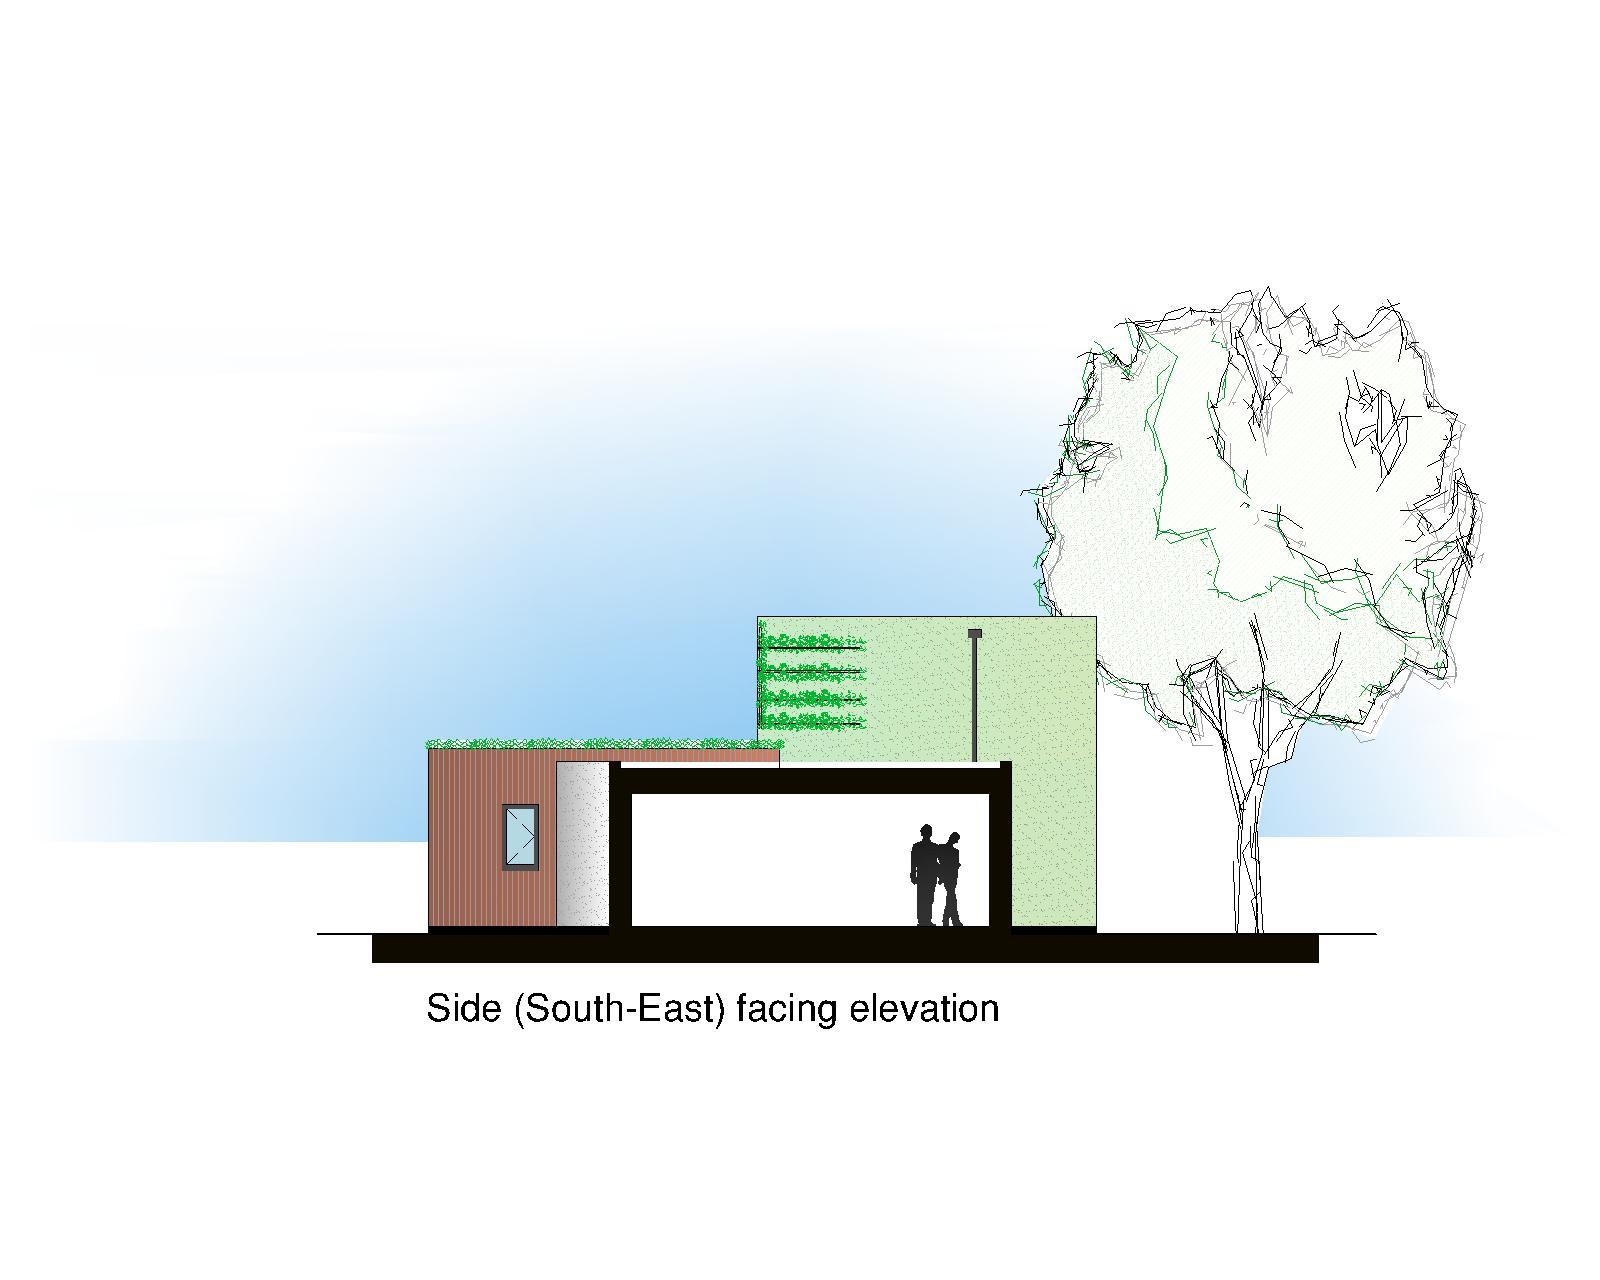 Side section/elevation